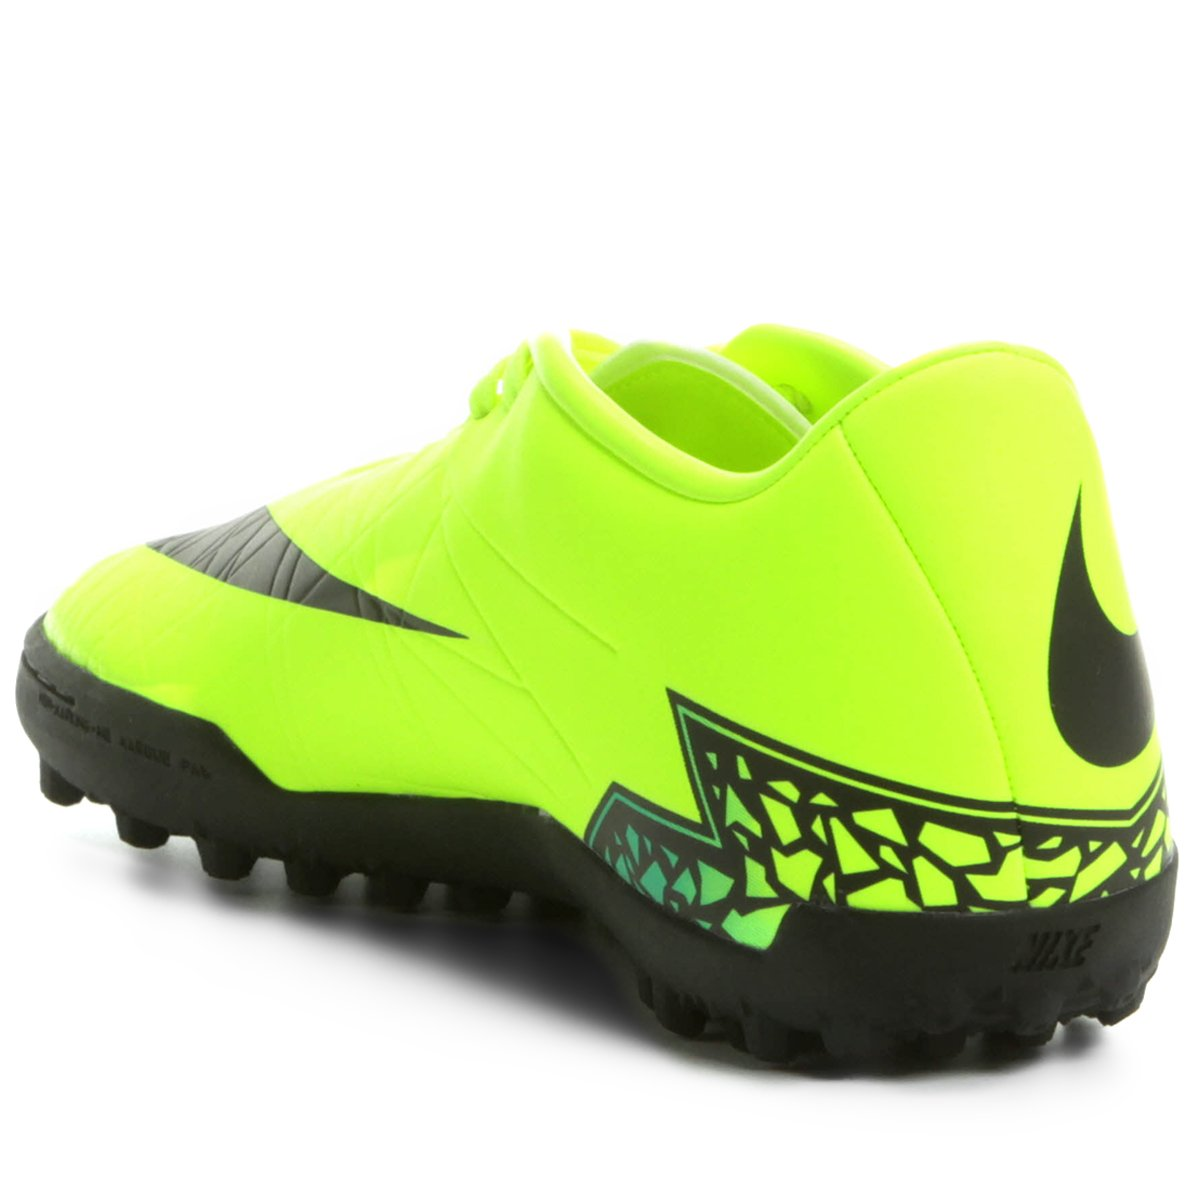 c83d5eecfa Chuteira Society Nike Hypervenom Phelon 2 TF - Compre Agora